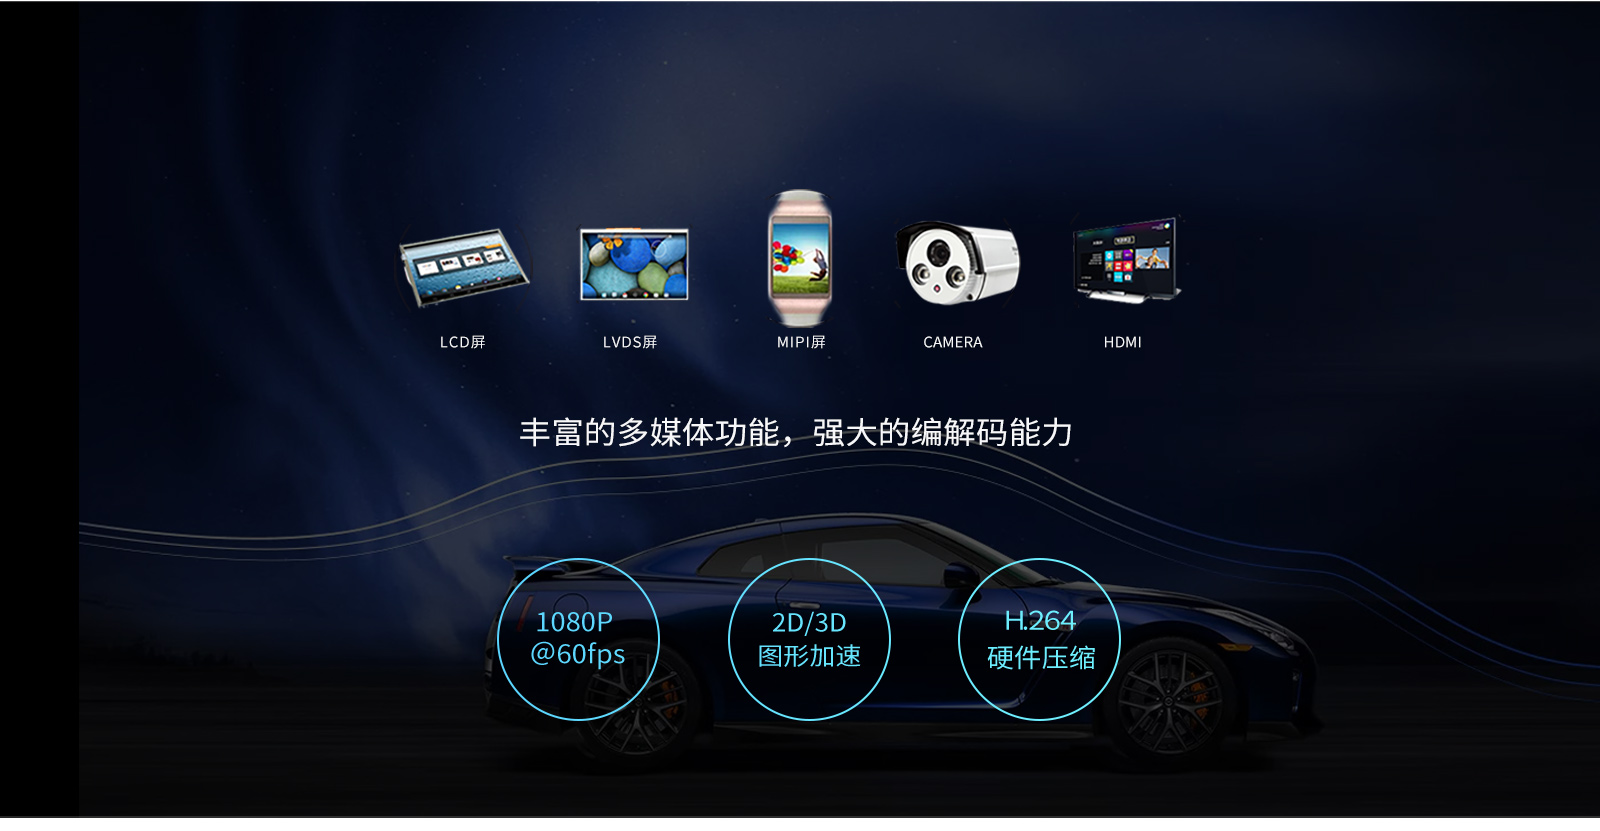 i.MX6Q duo显示 duo图像采集接口